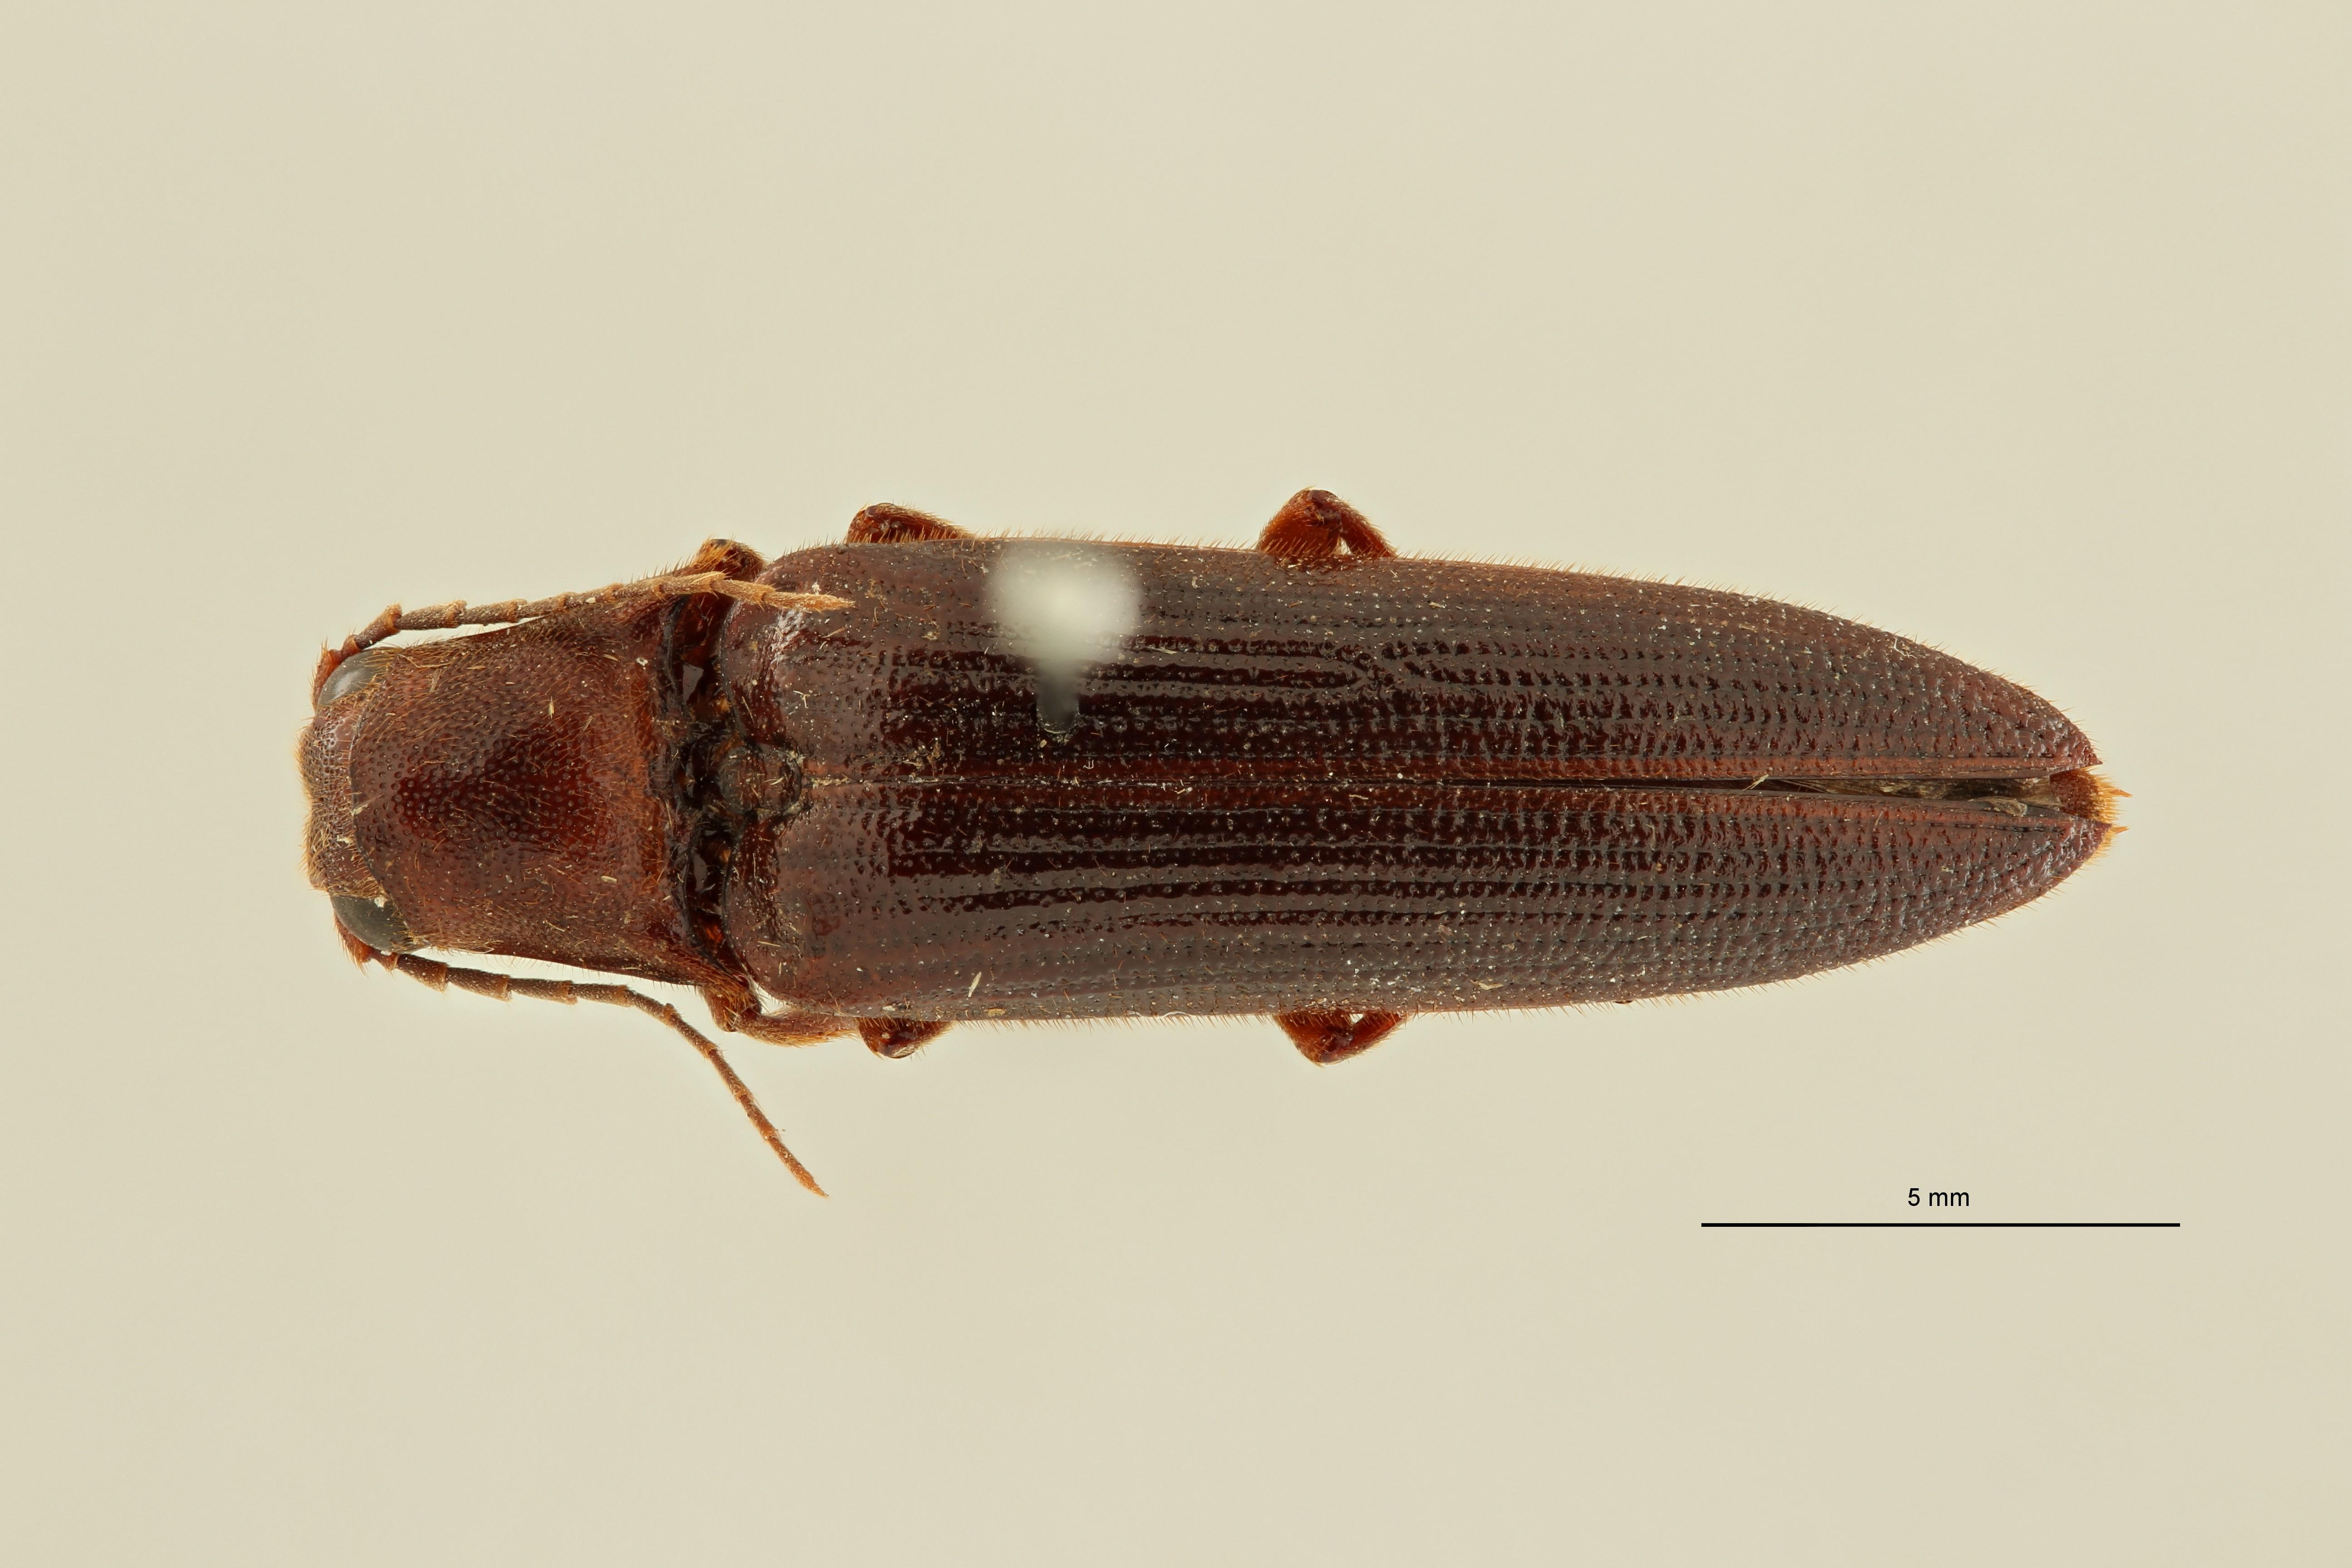 Eudicronychus distinctus var. fuscatus pt6 D ZS PMax Scaled.jpeg